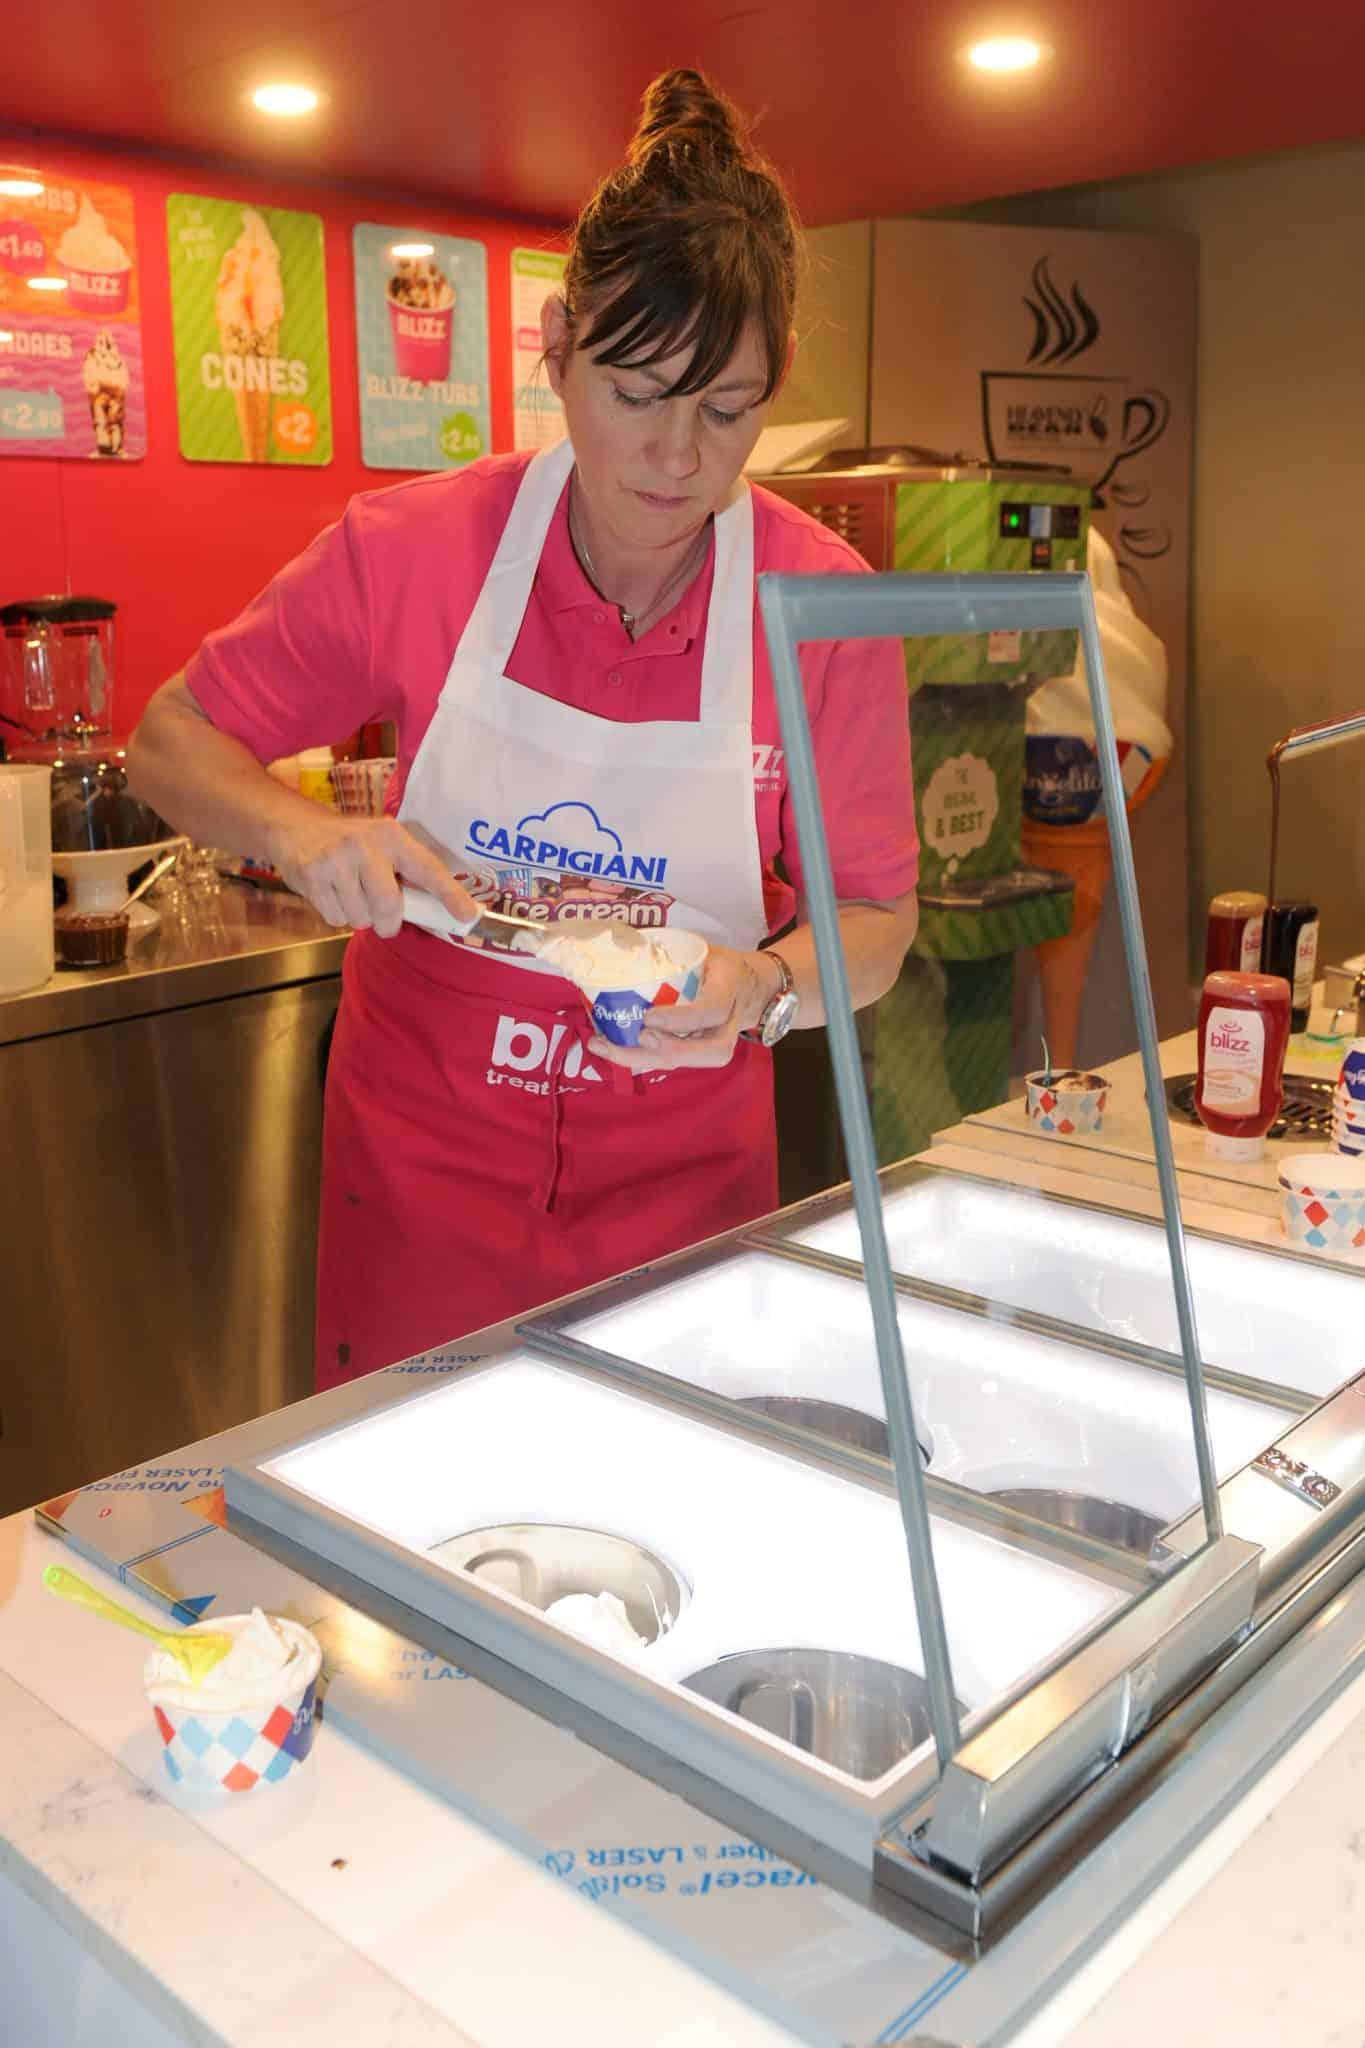 Martin Food Equipment newspics-image.3 Irelands 1st Ice Cream & Treats Extravaganza News